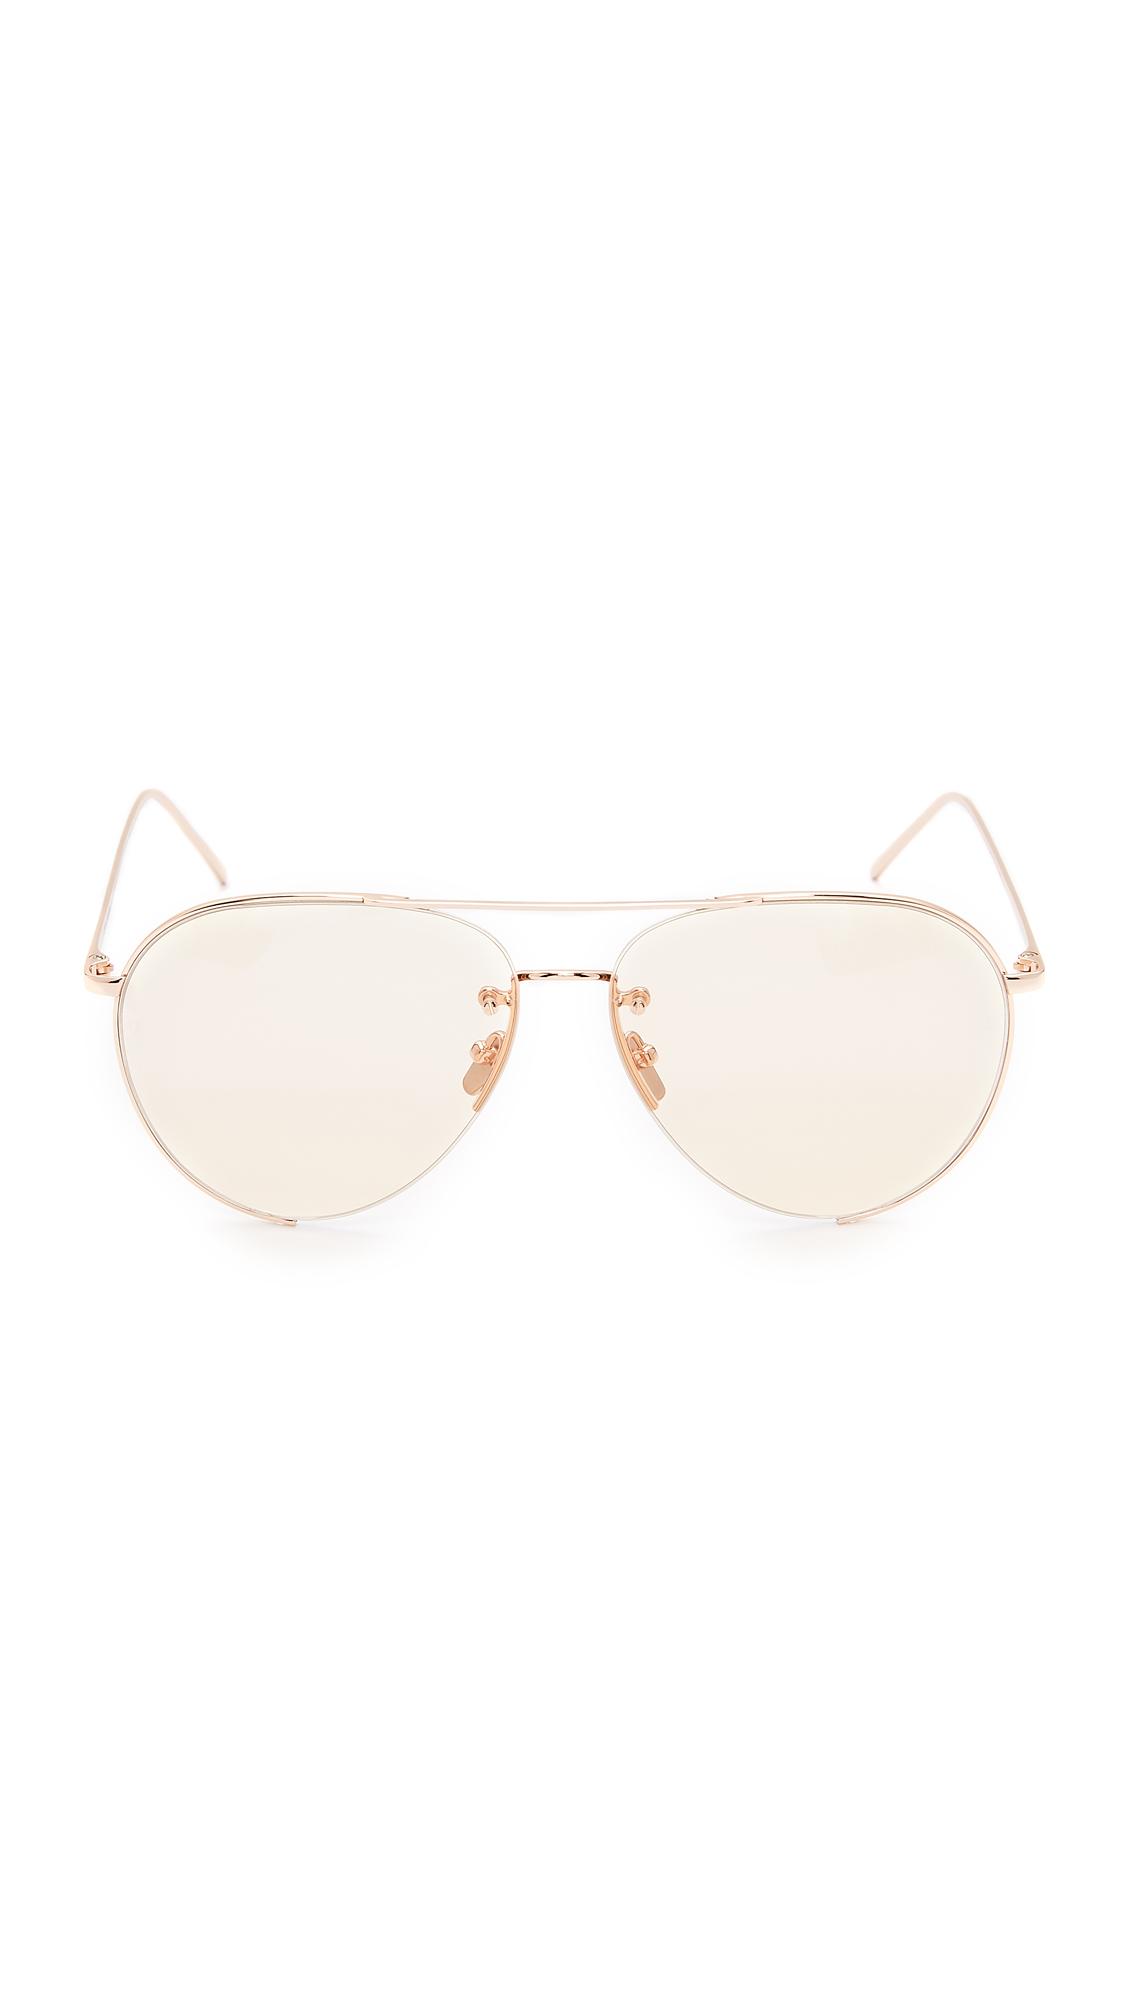 8d22c8f2e01 Linda Farrow Luxe 18k Rose Gold Plate Aviator Sunglasses